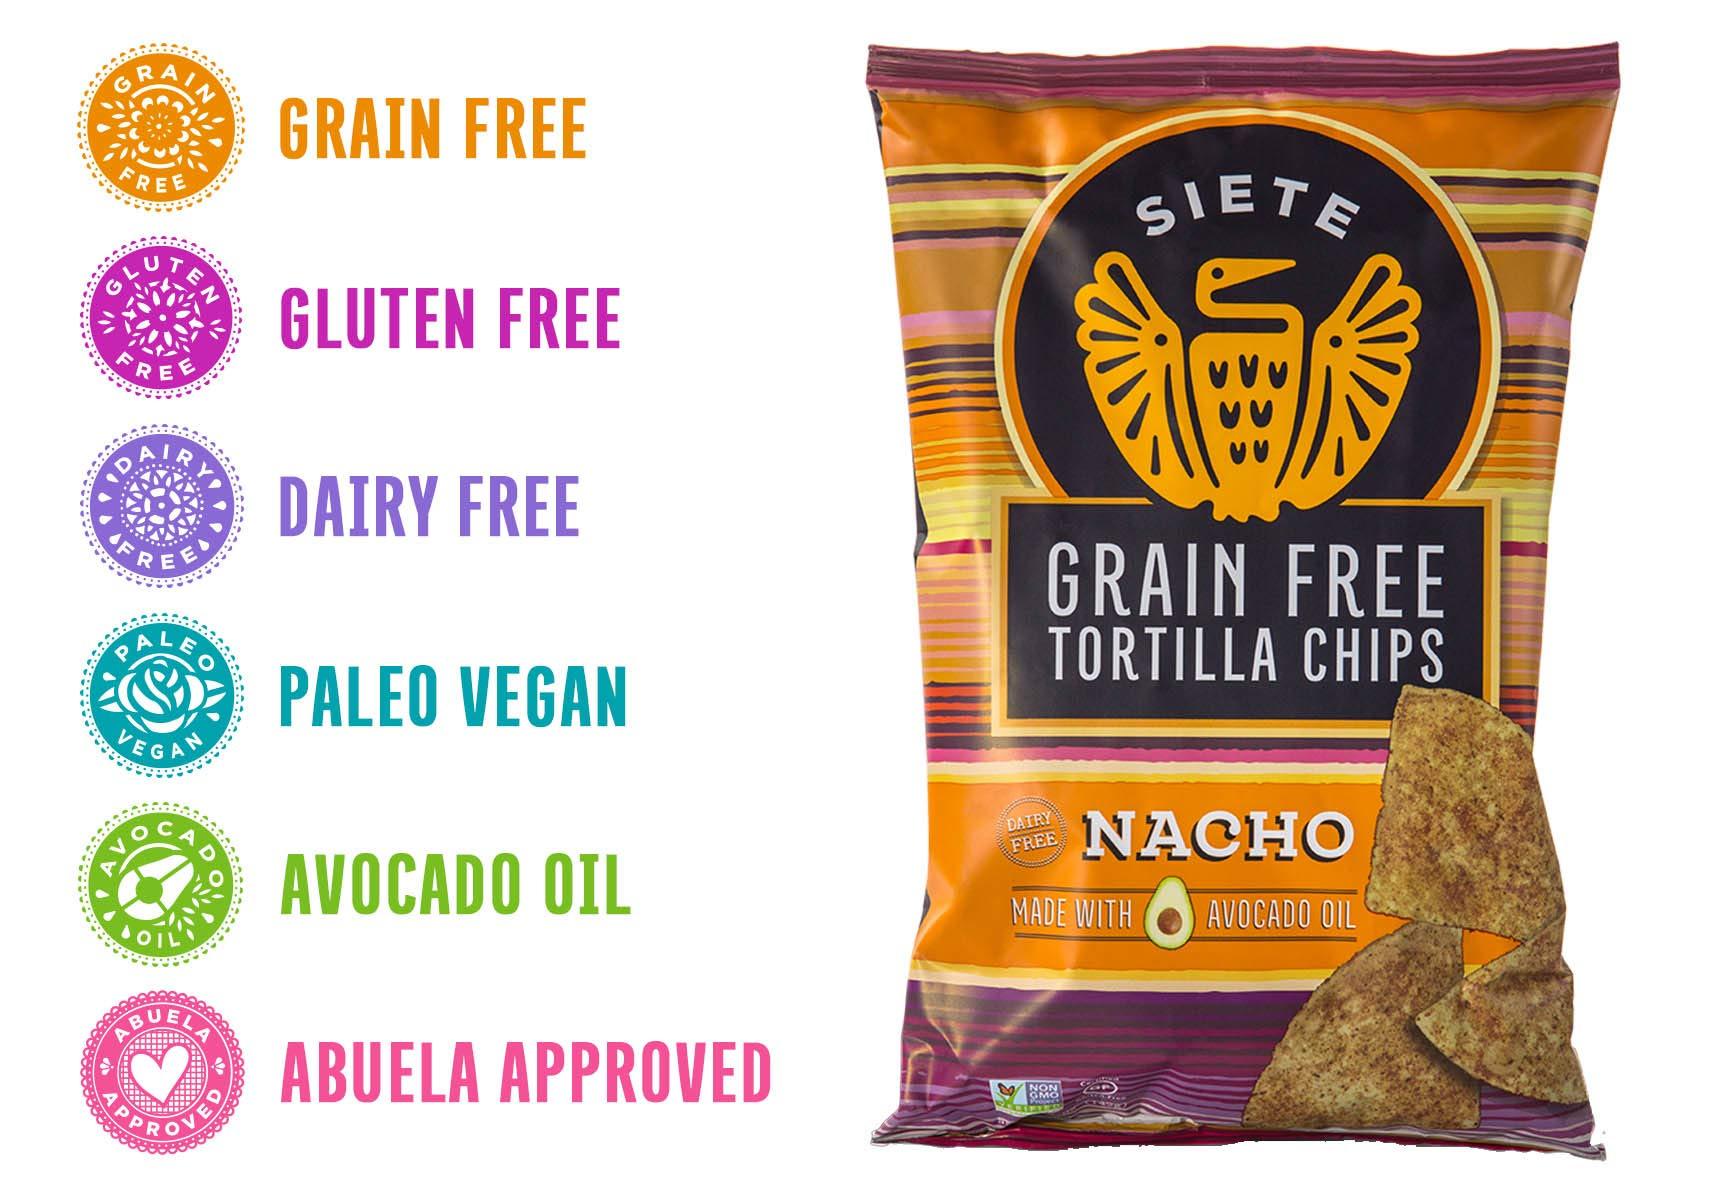 Siete Grain Free Tortilla Chips, Nacho, 5 oz by Siete